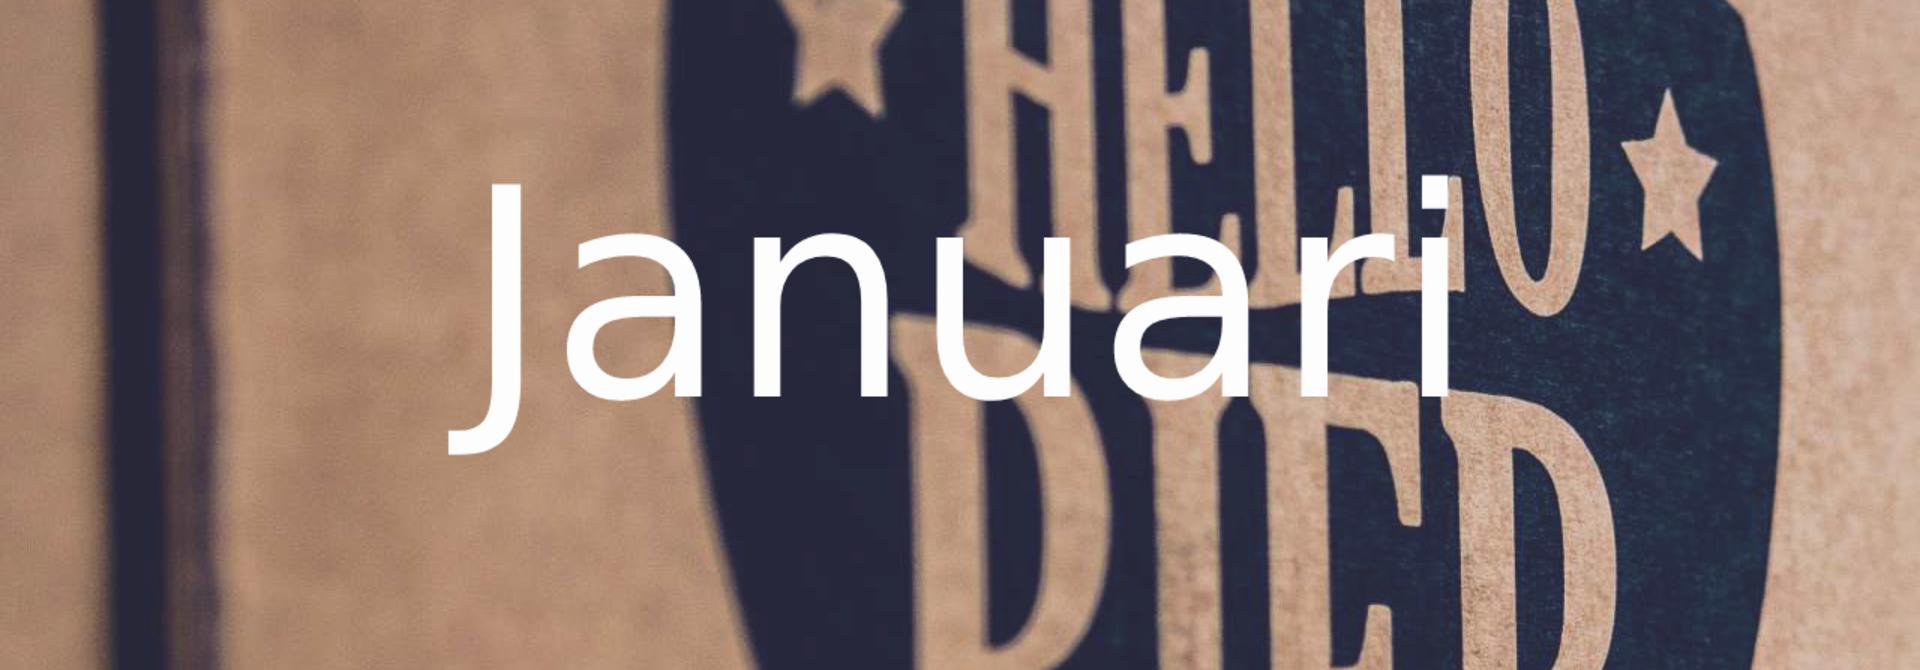 Speciaalbier – bierpakket januari 2019